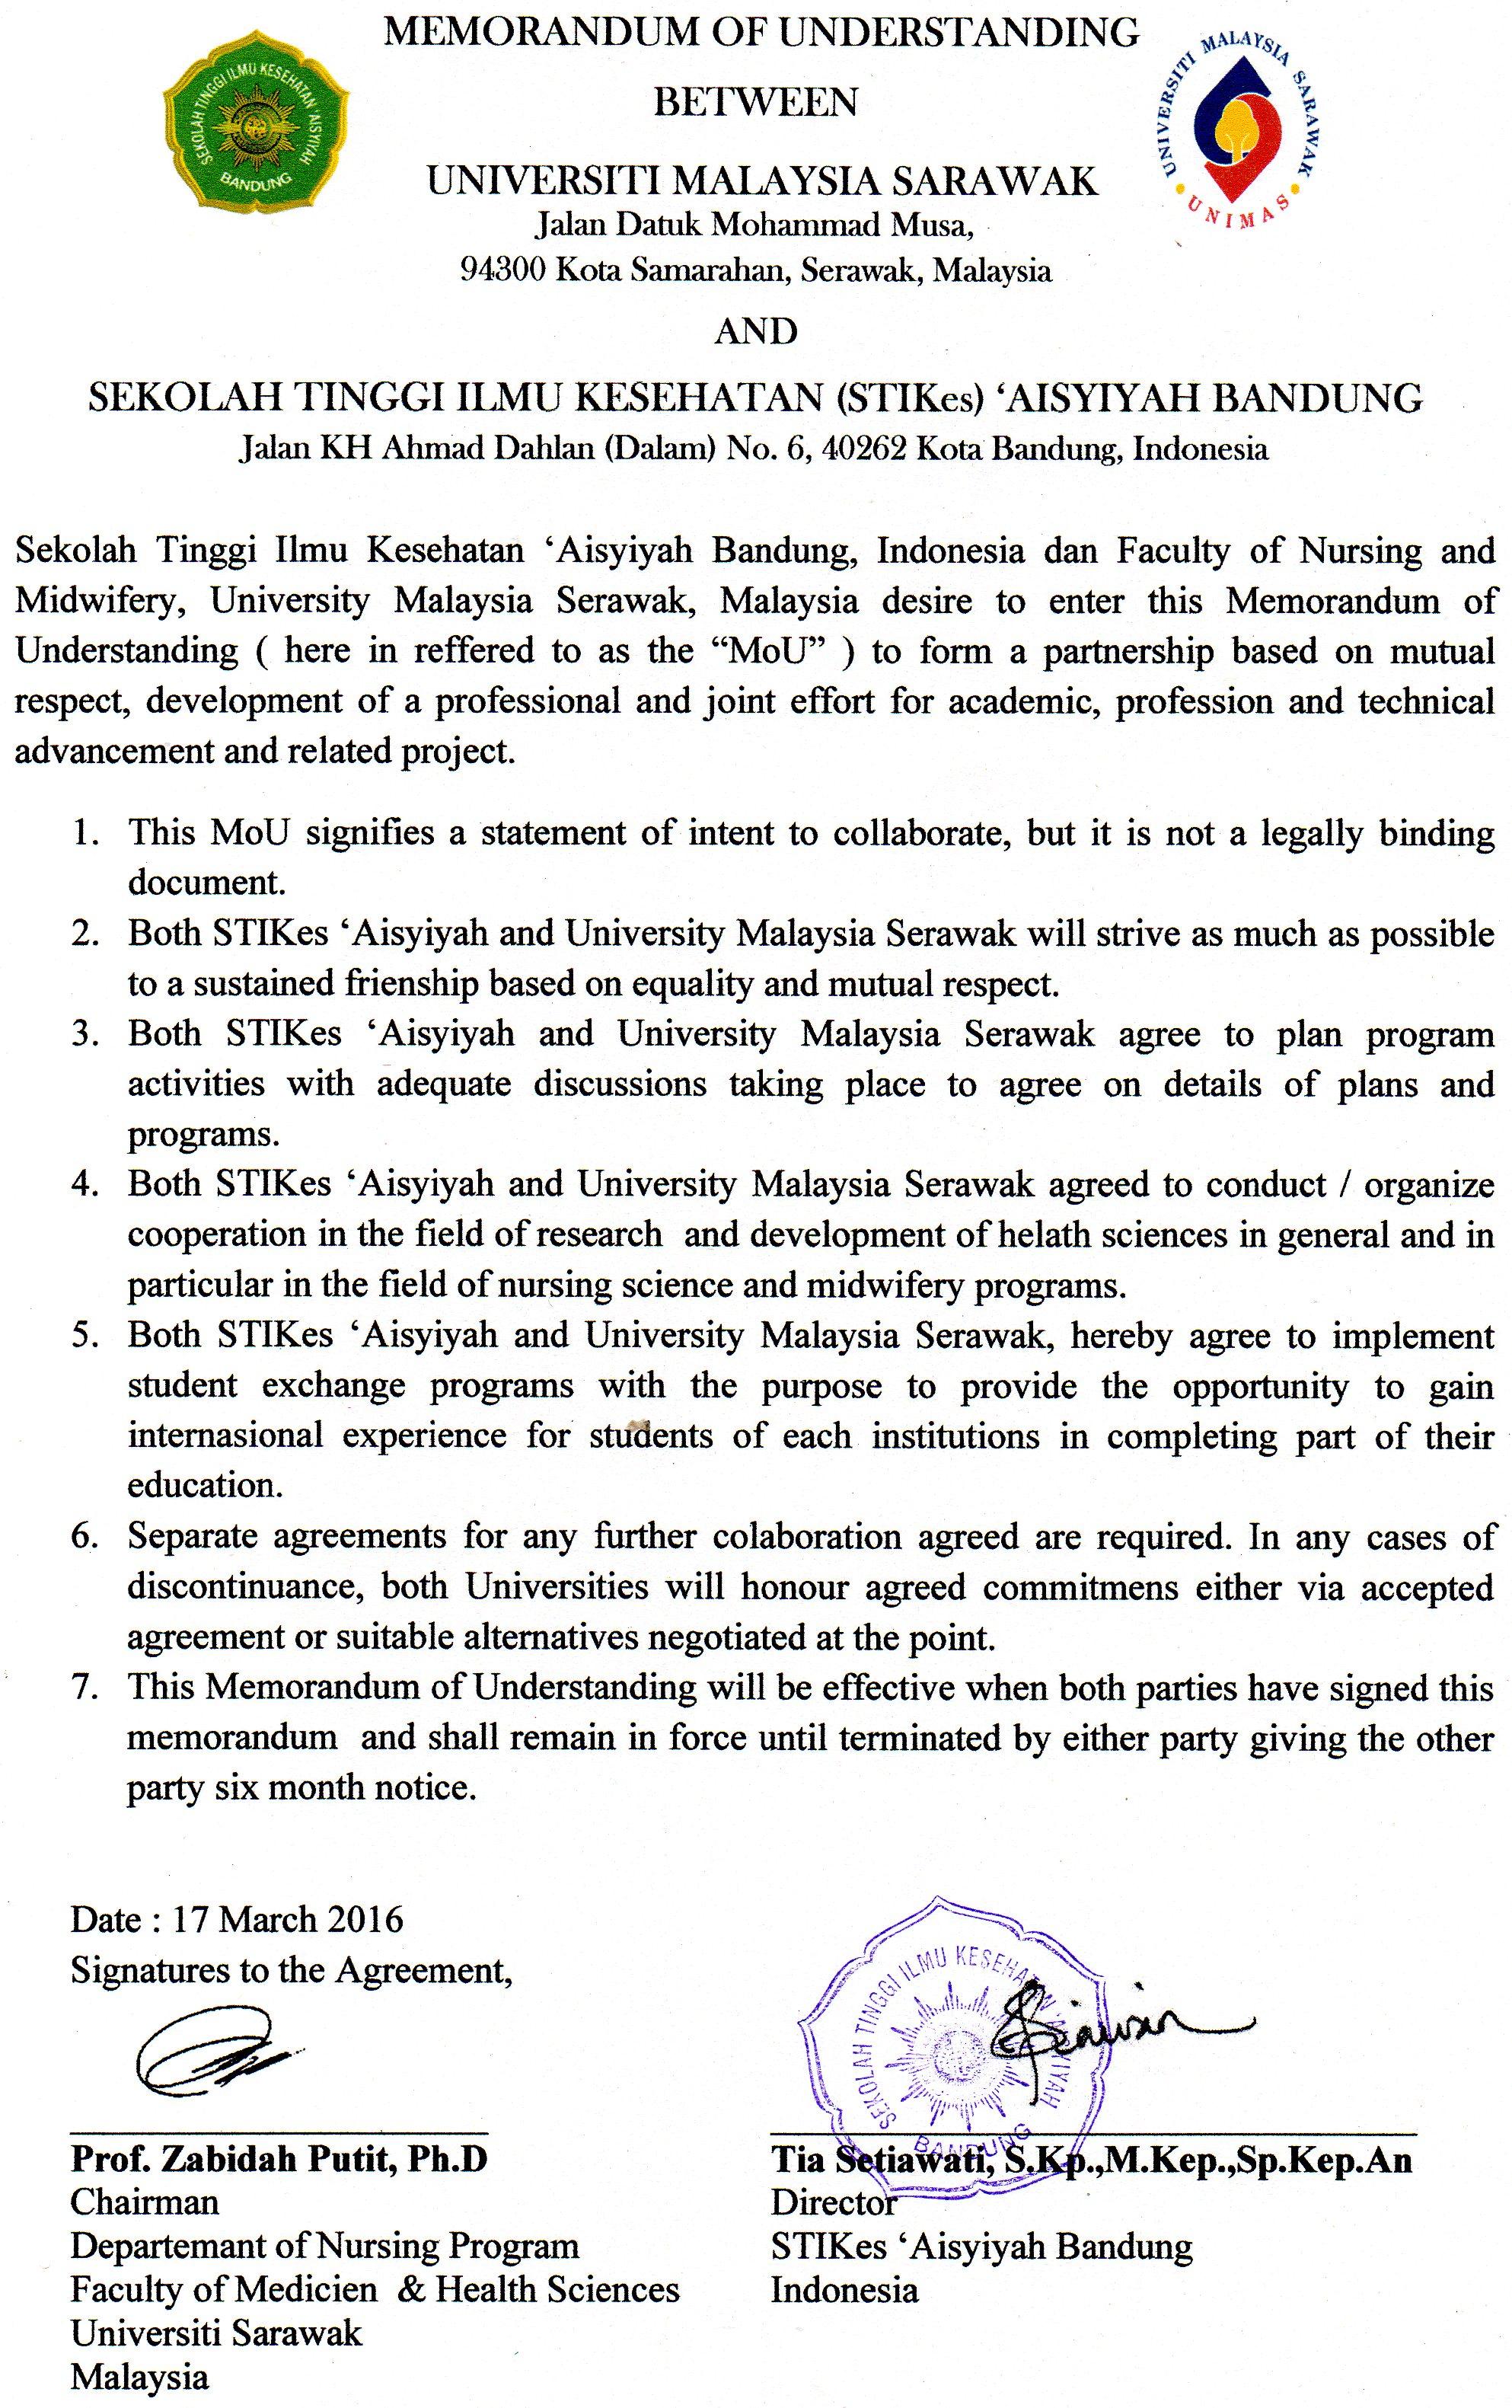 MOU dengan Universiti Malaysia Sarawak, Serawak Malaysia